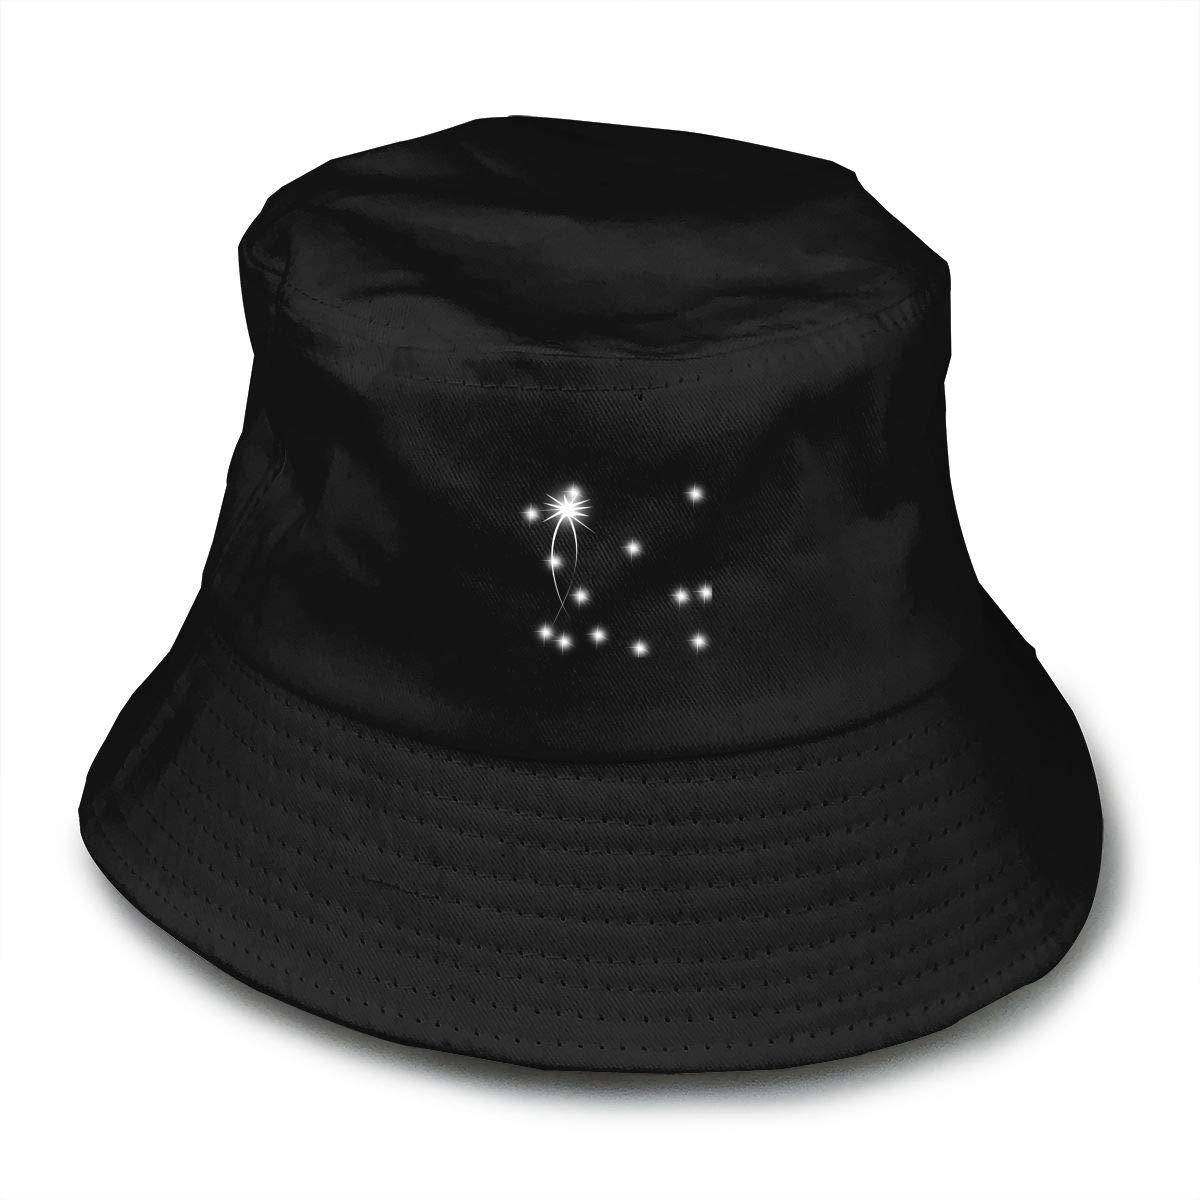 White Shining Dot Unisex Cotton Packable Black Travel Bucket Hat Fishing Cap